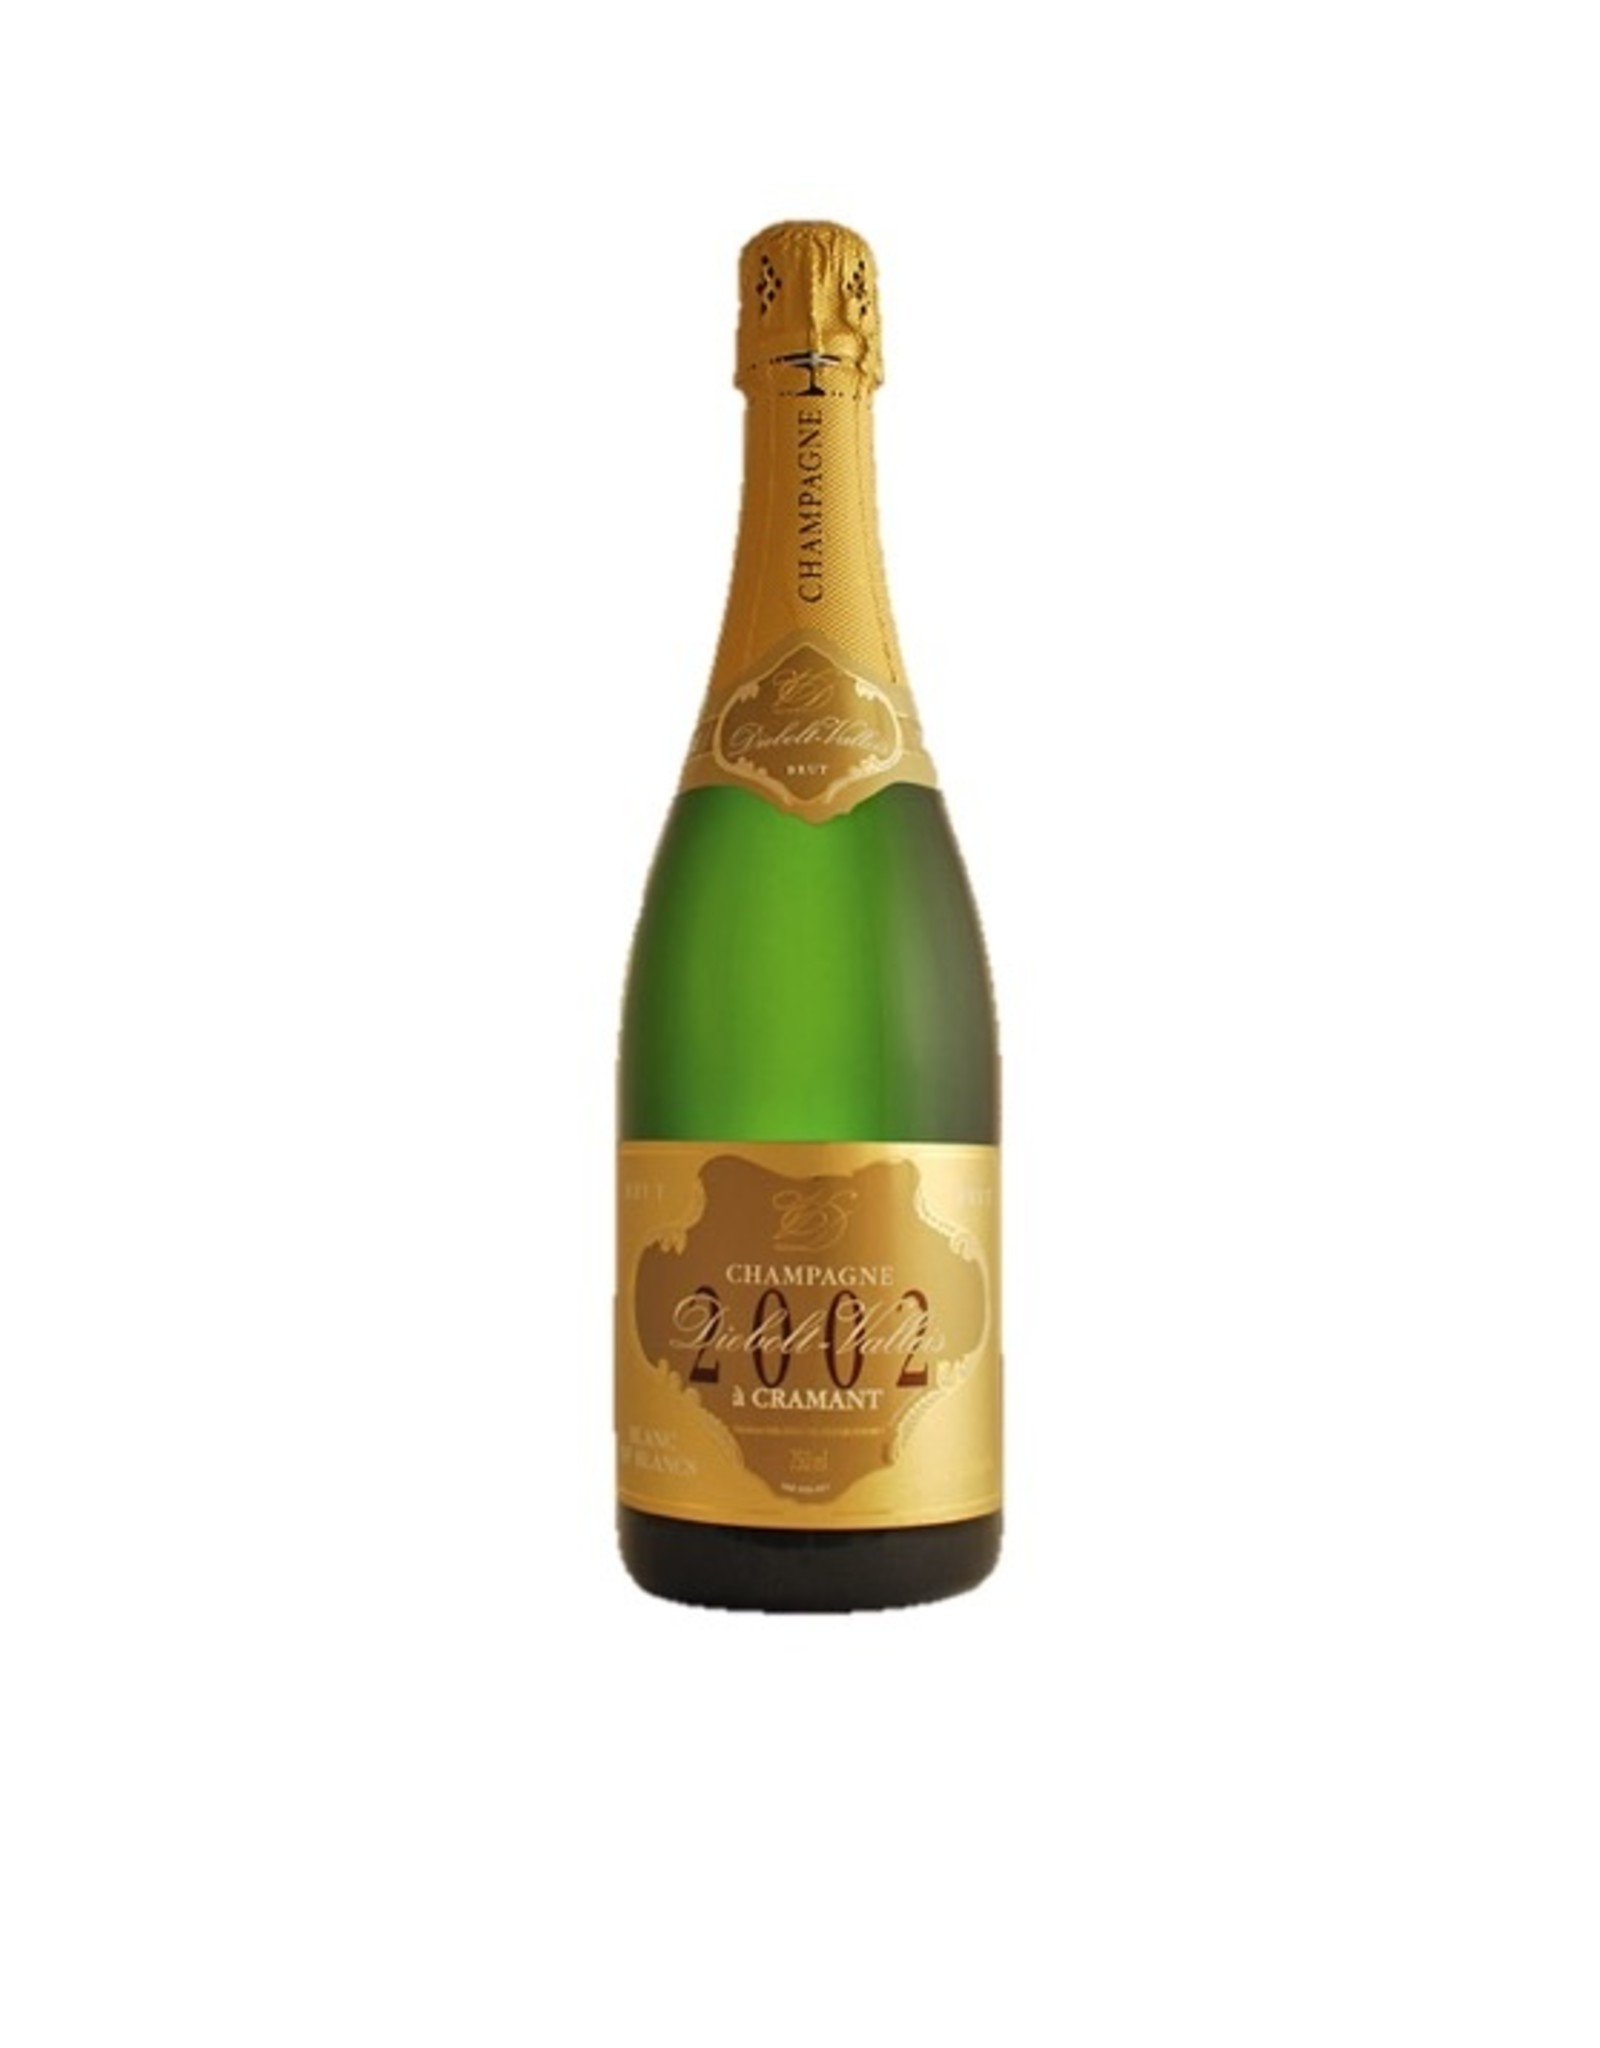 Diebolt-Vallois Champagne Diebolt Vallois Millesime 2010